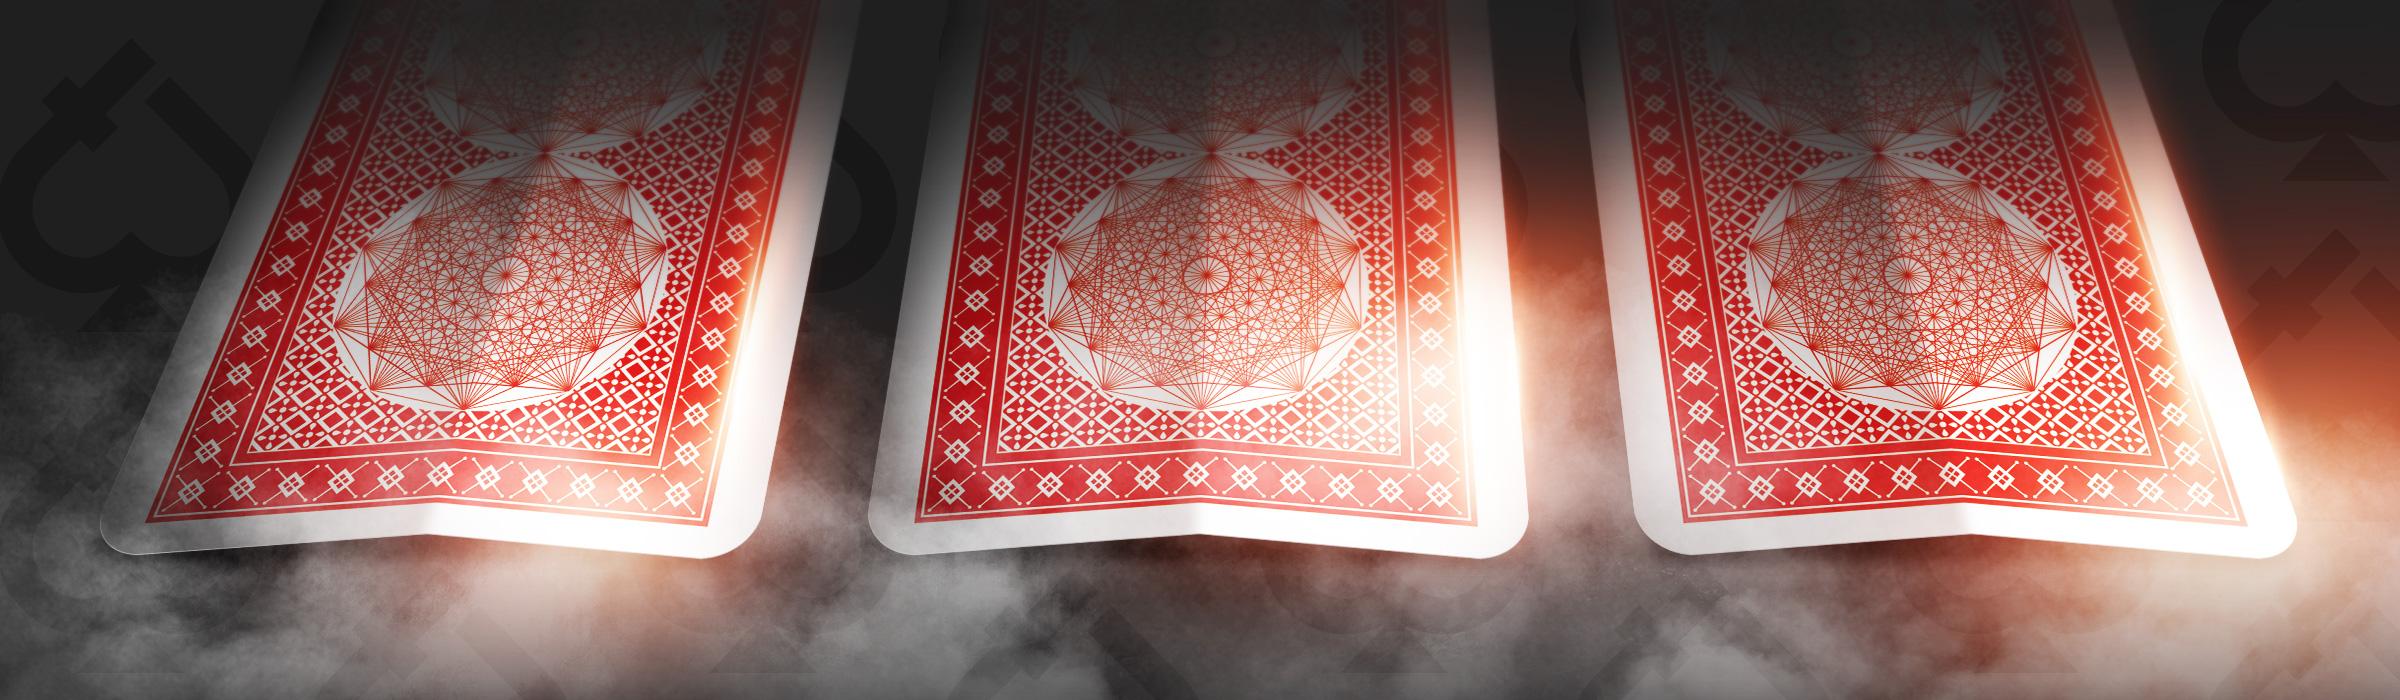 The Three Card Monte Scam